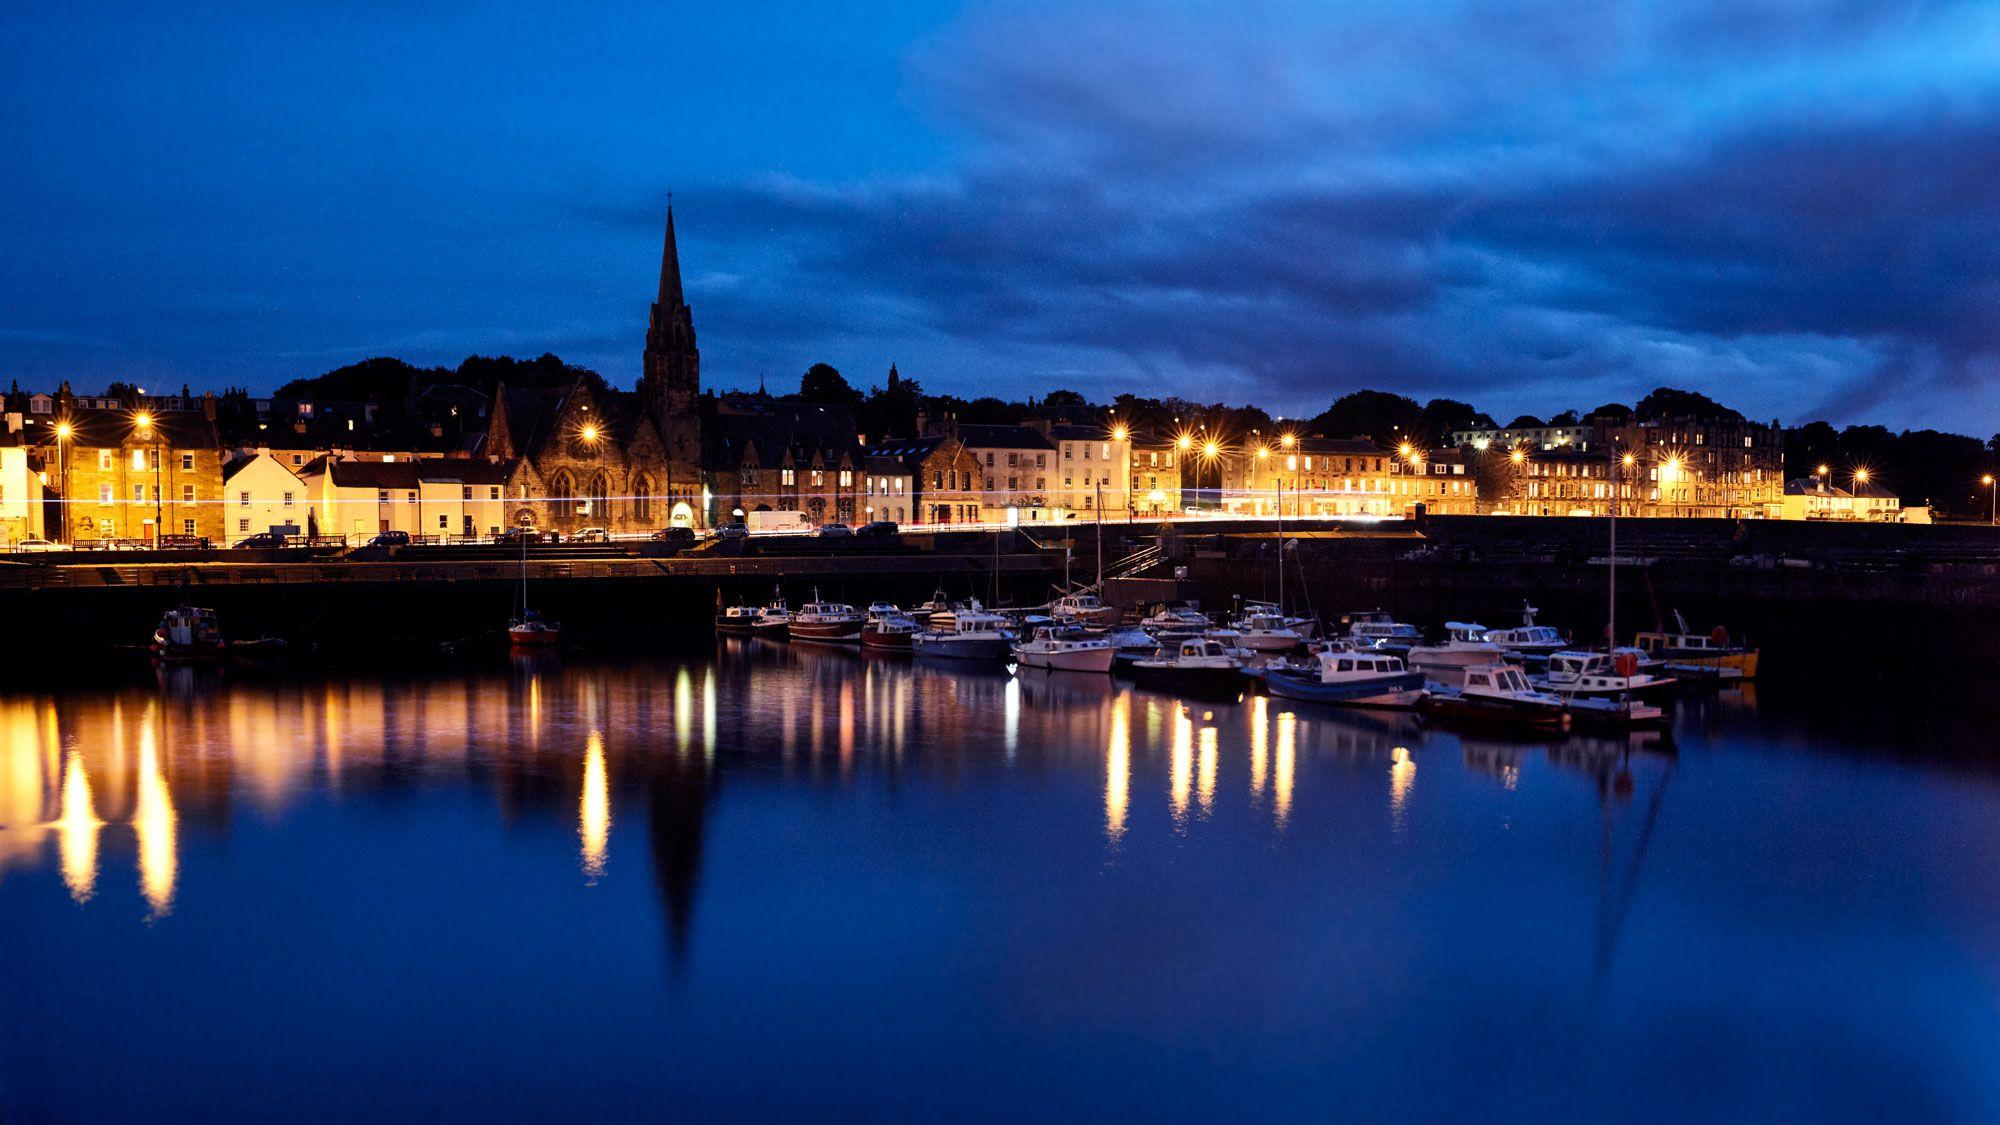 Newhaven harbour, Edinburgh #longexposure #photography #newhavenharbour #edinburgh #edinburghphotographer #dimitriosphotography #harbour #scotland #sunset #sea #bluehour #ig_scotland #edinphoto #igersscotland © 2016 Dimitrios Lachanis